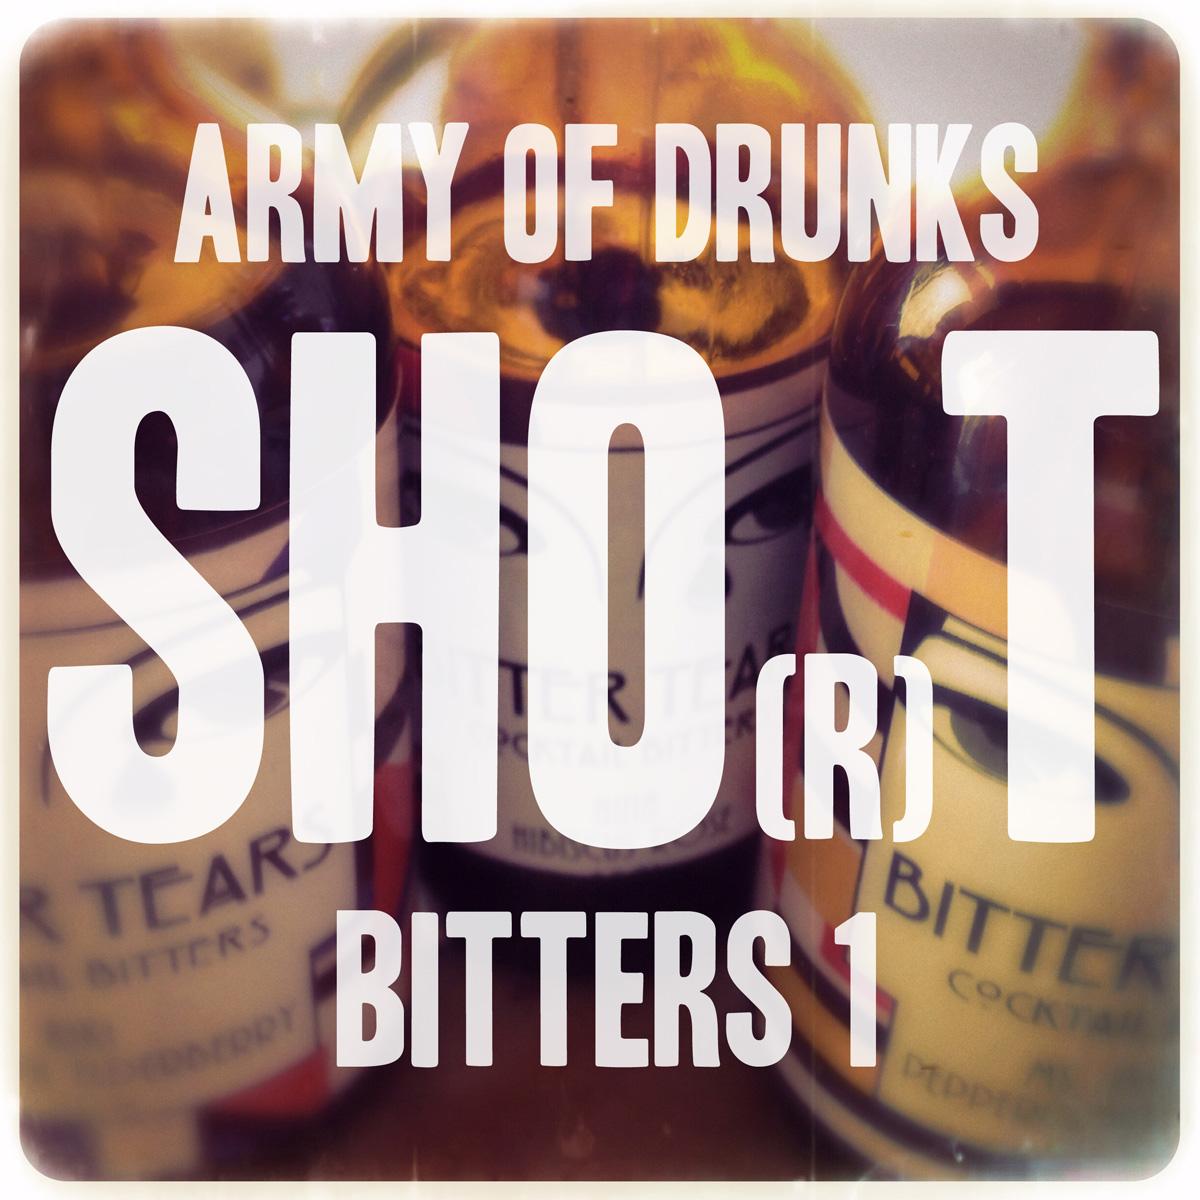 SHO(r)T - Bitters no. 1